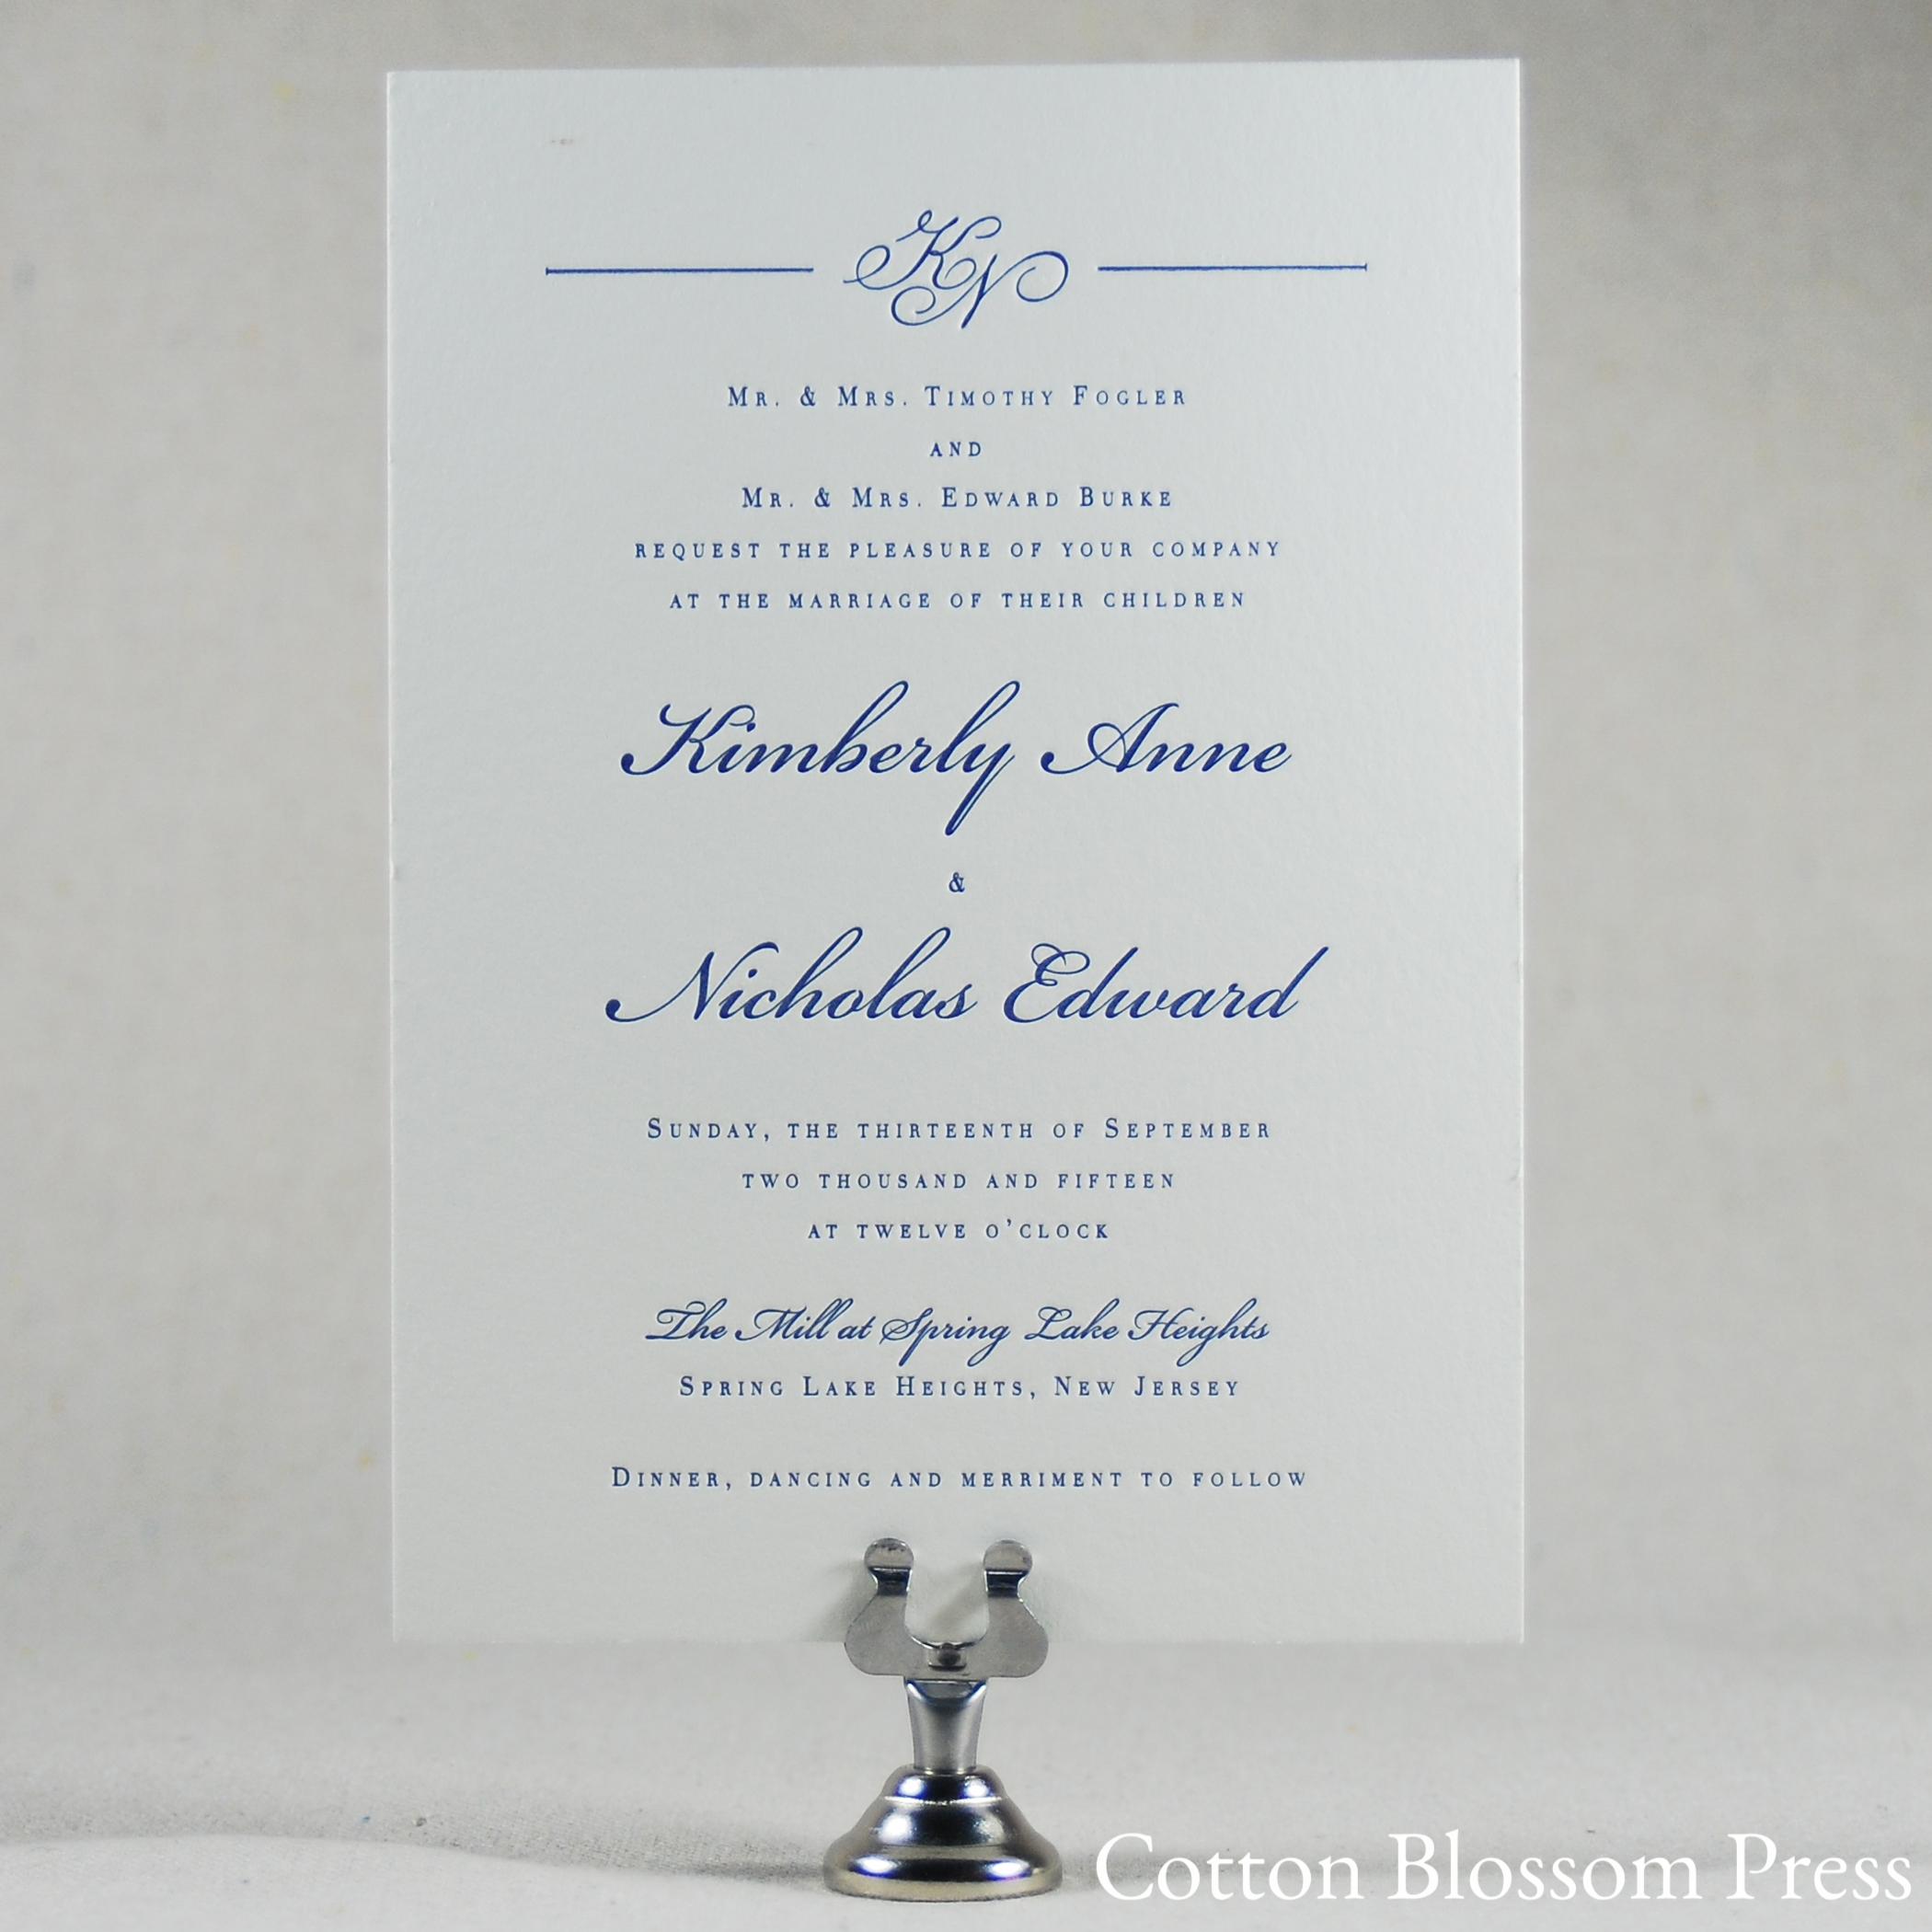 CBP-Wedding_Kimberly_Invite.JPG